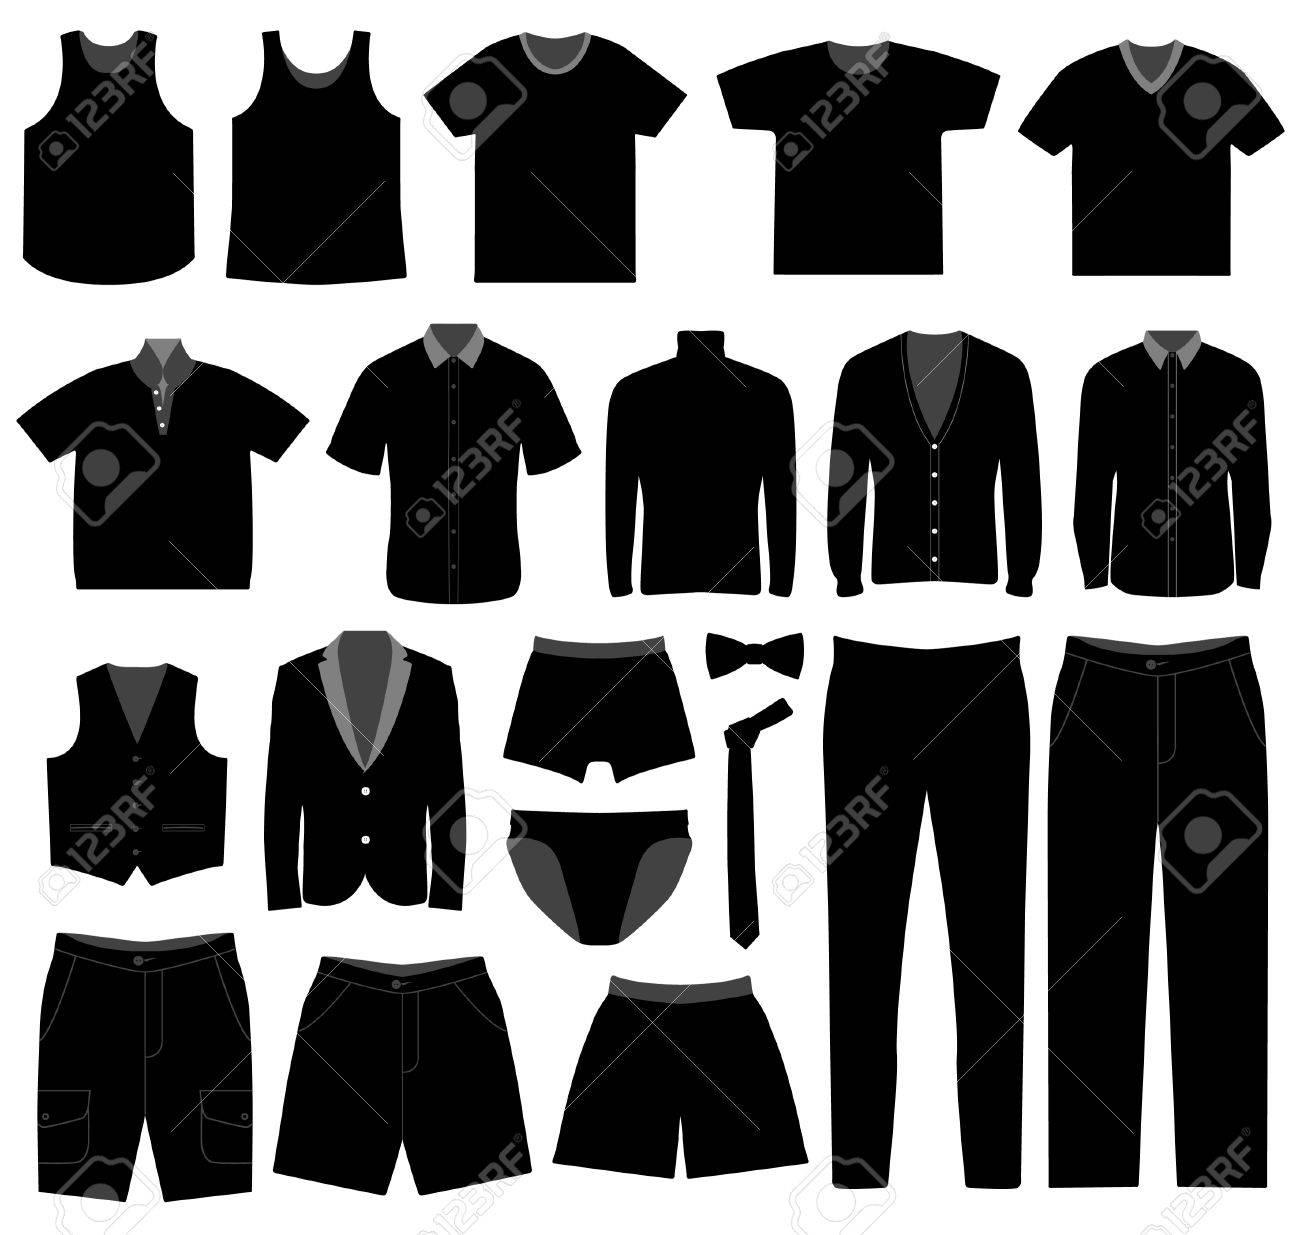 f04e30fa97b Men Man Male Apparel Shirt Cloth Wear Stock Vector - 7796693